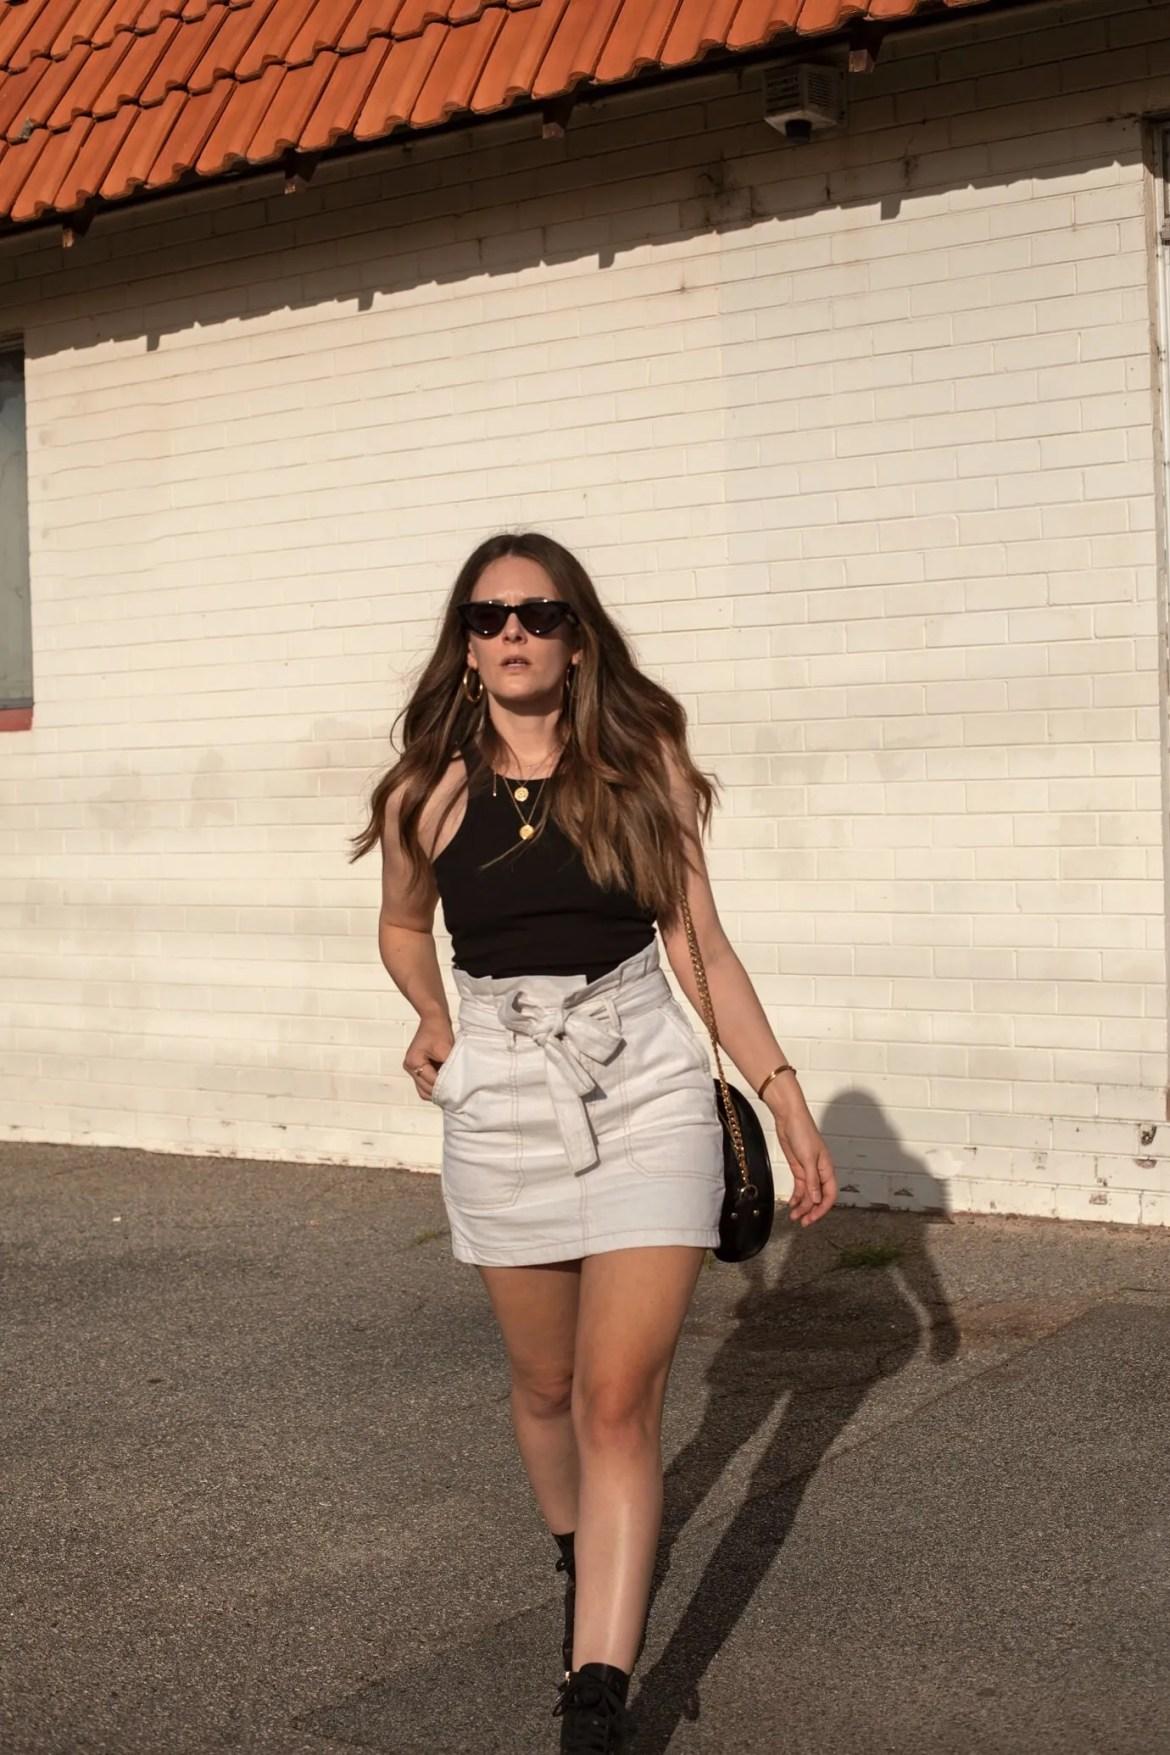 black tank top and cream mini skirt outfit idea